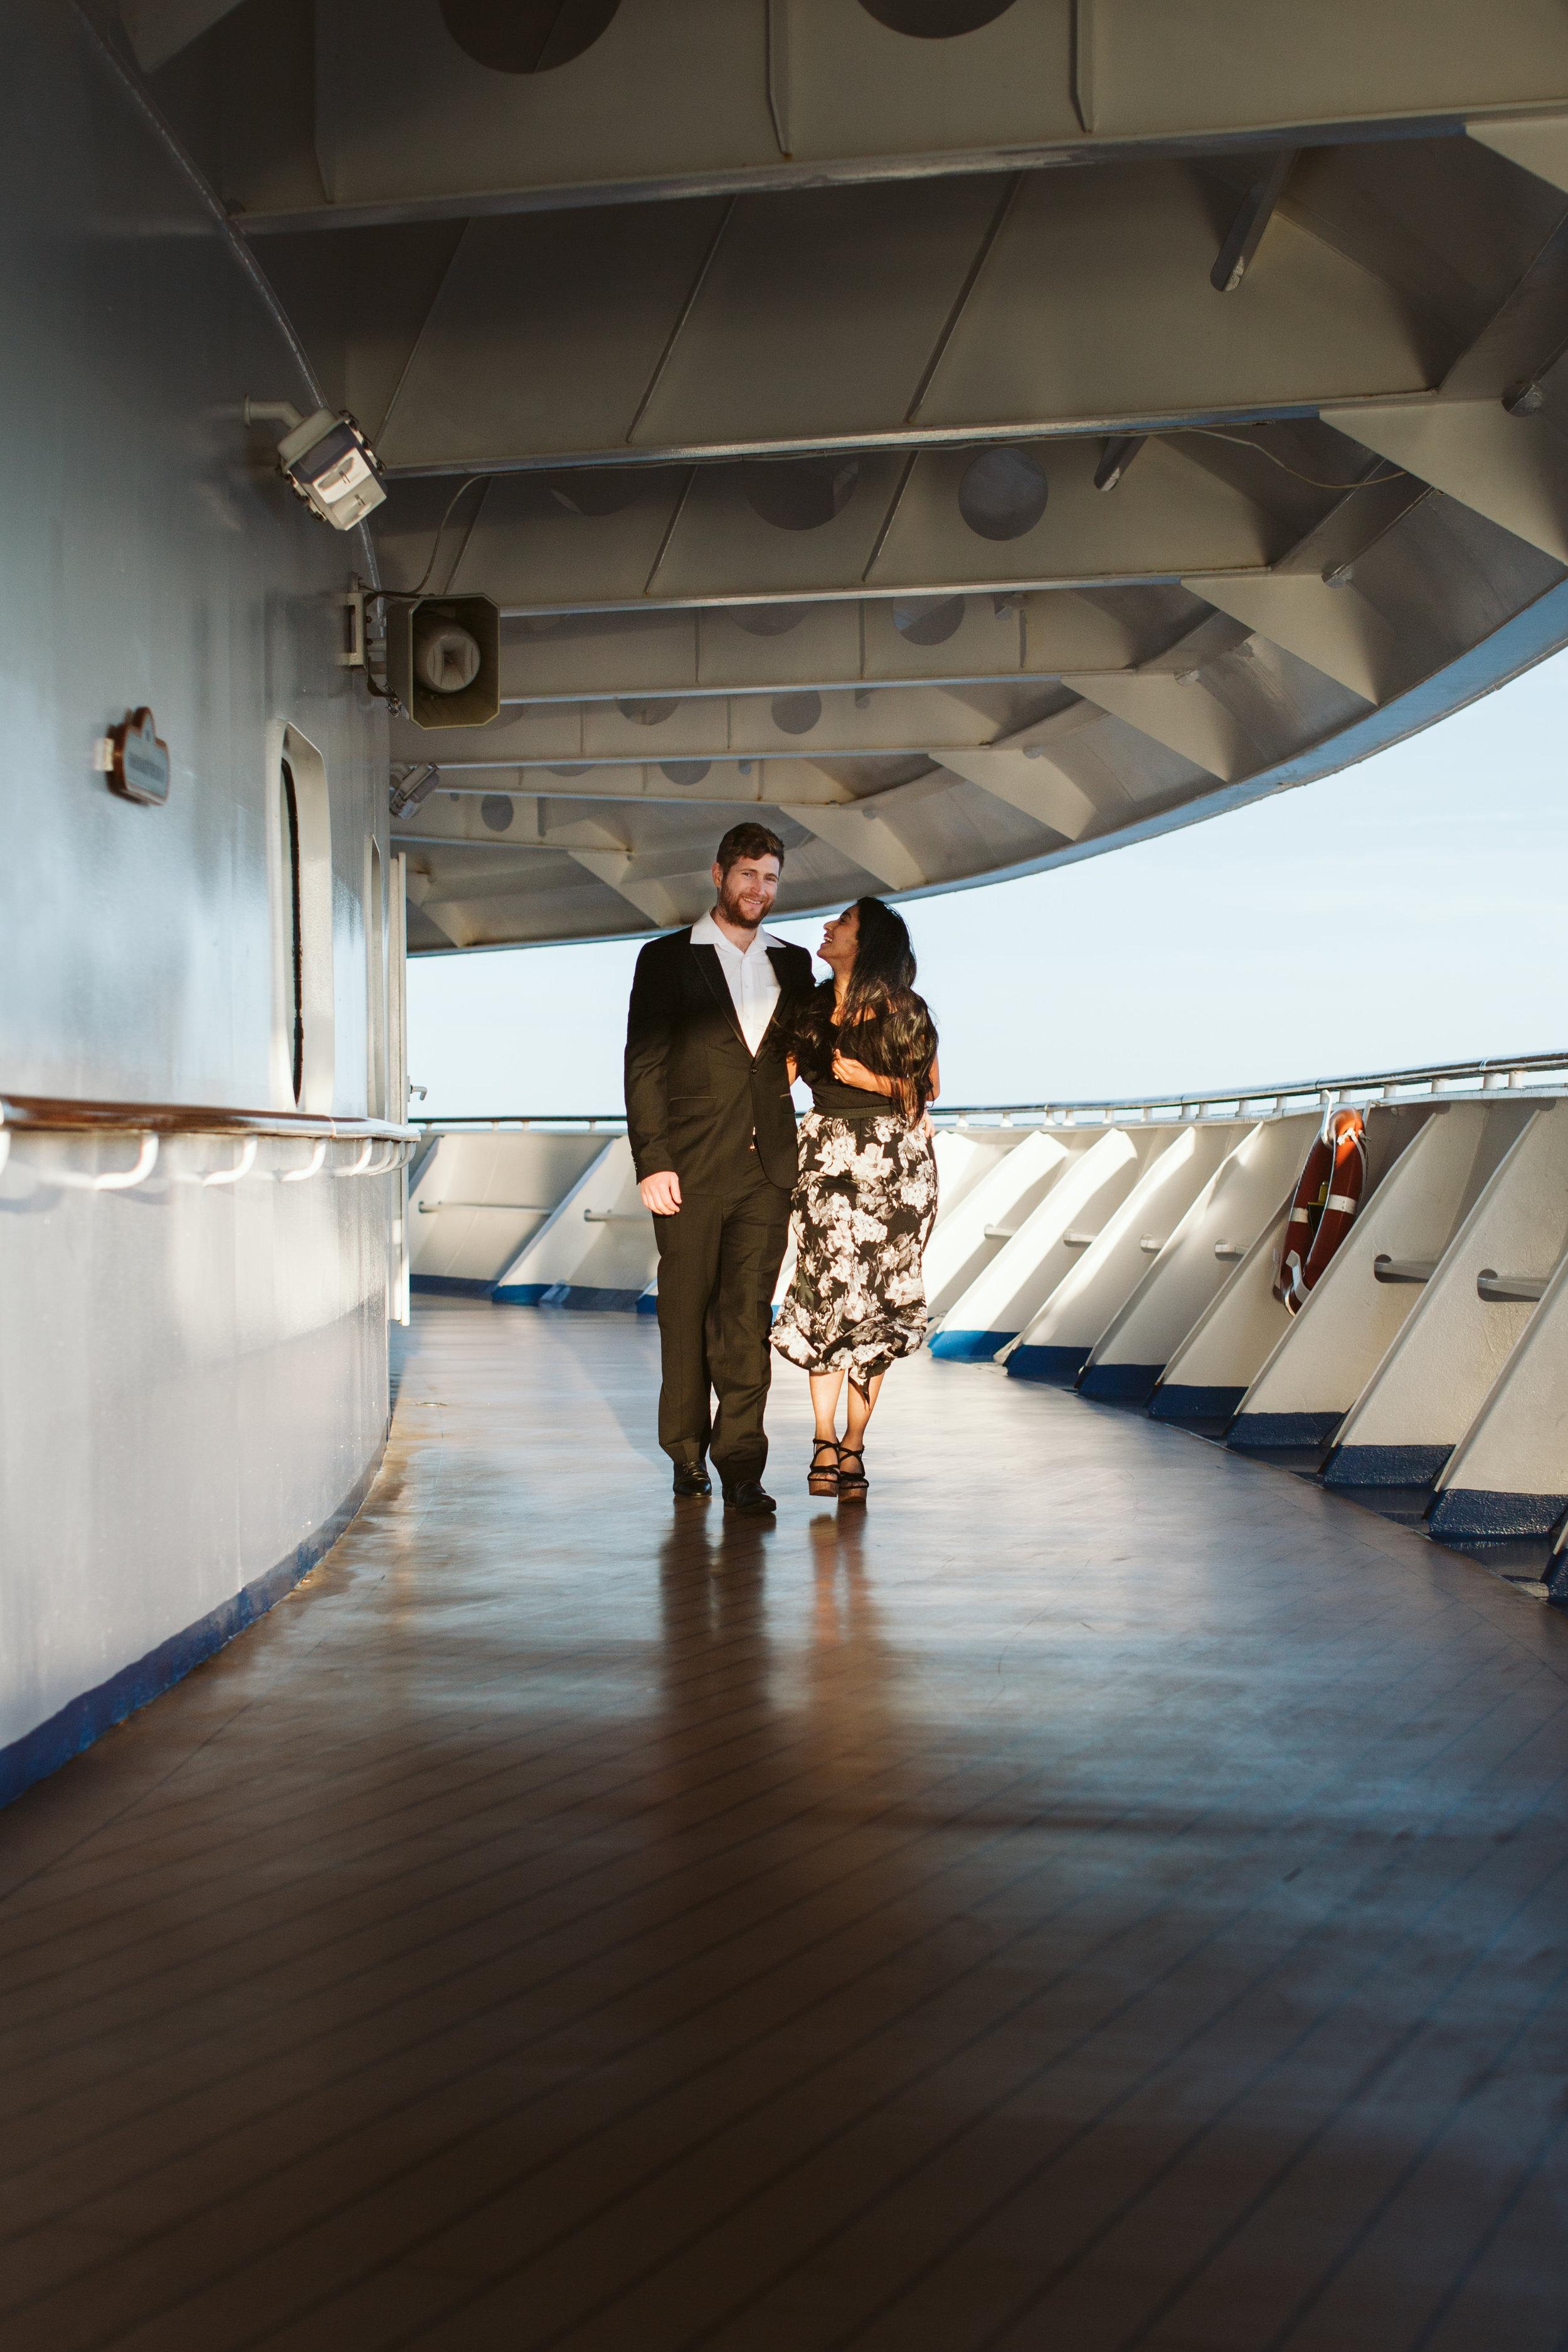 Engagement_Southern Oregon_Cruise_Alaska_Couple (15 of 15).jpg